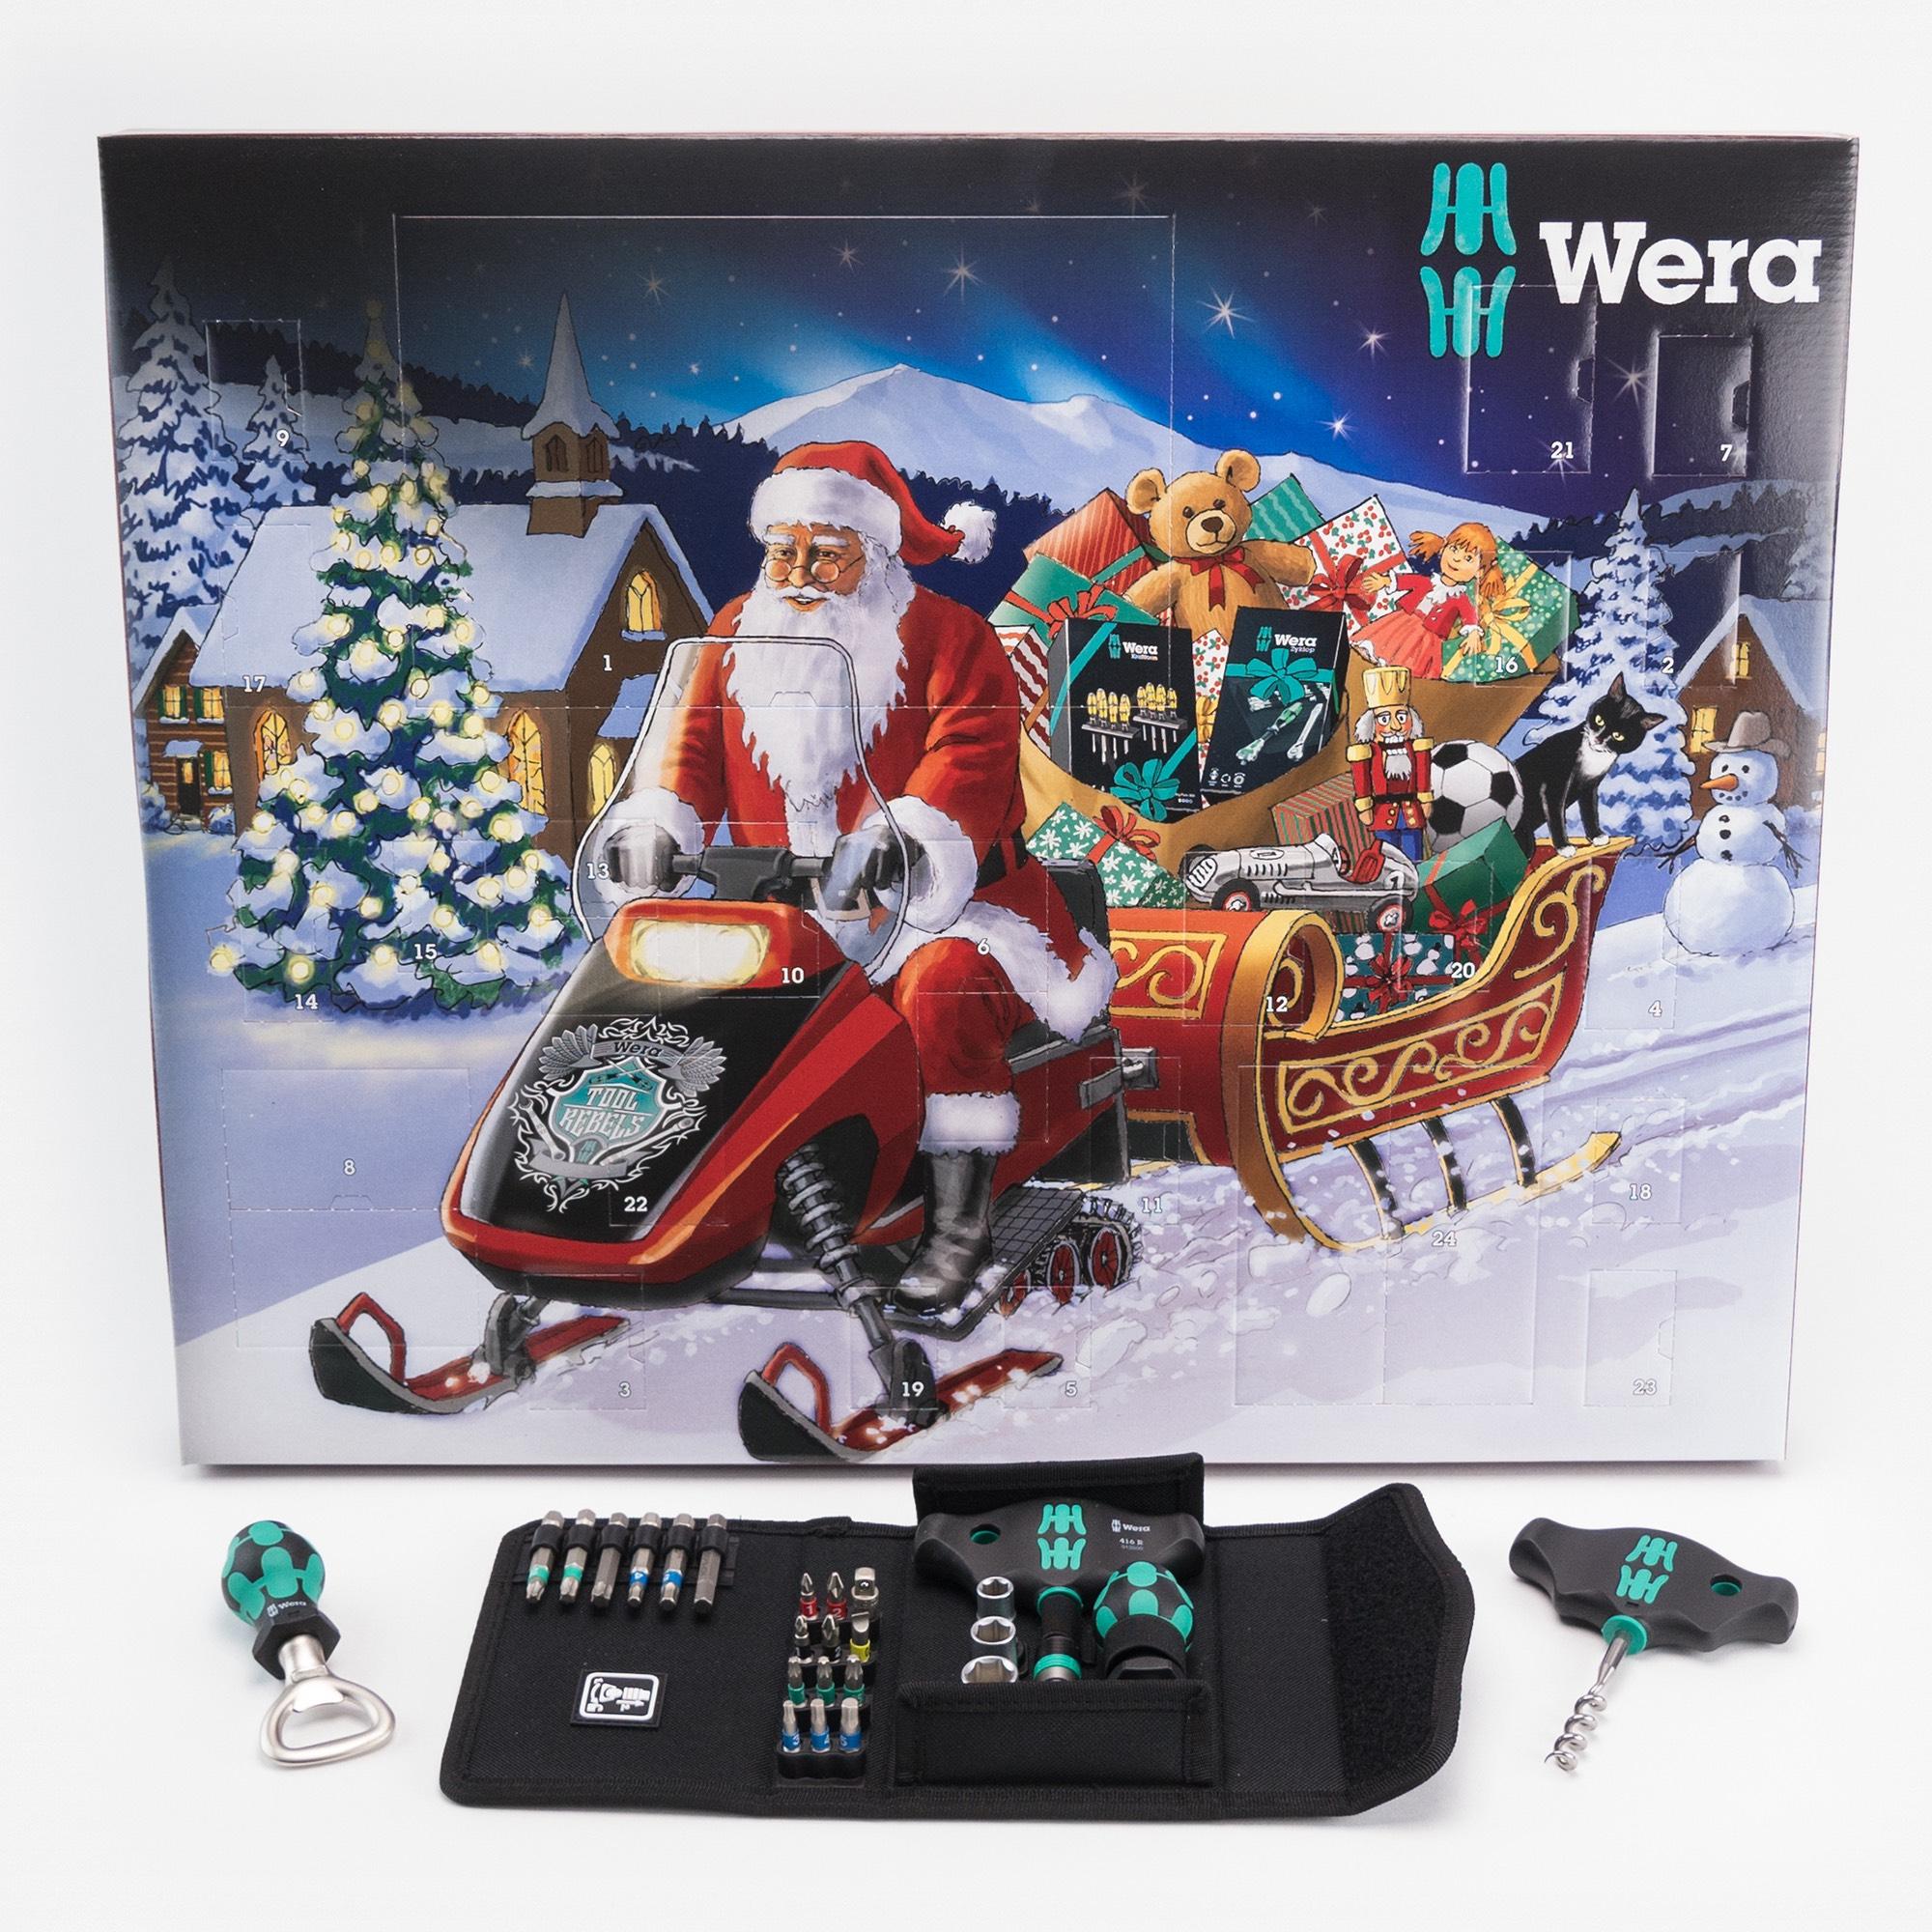 Wera tool advent calendar £39.99 @ Screwfix